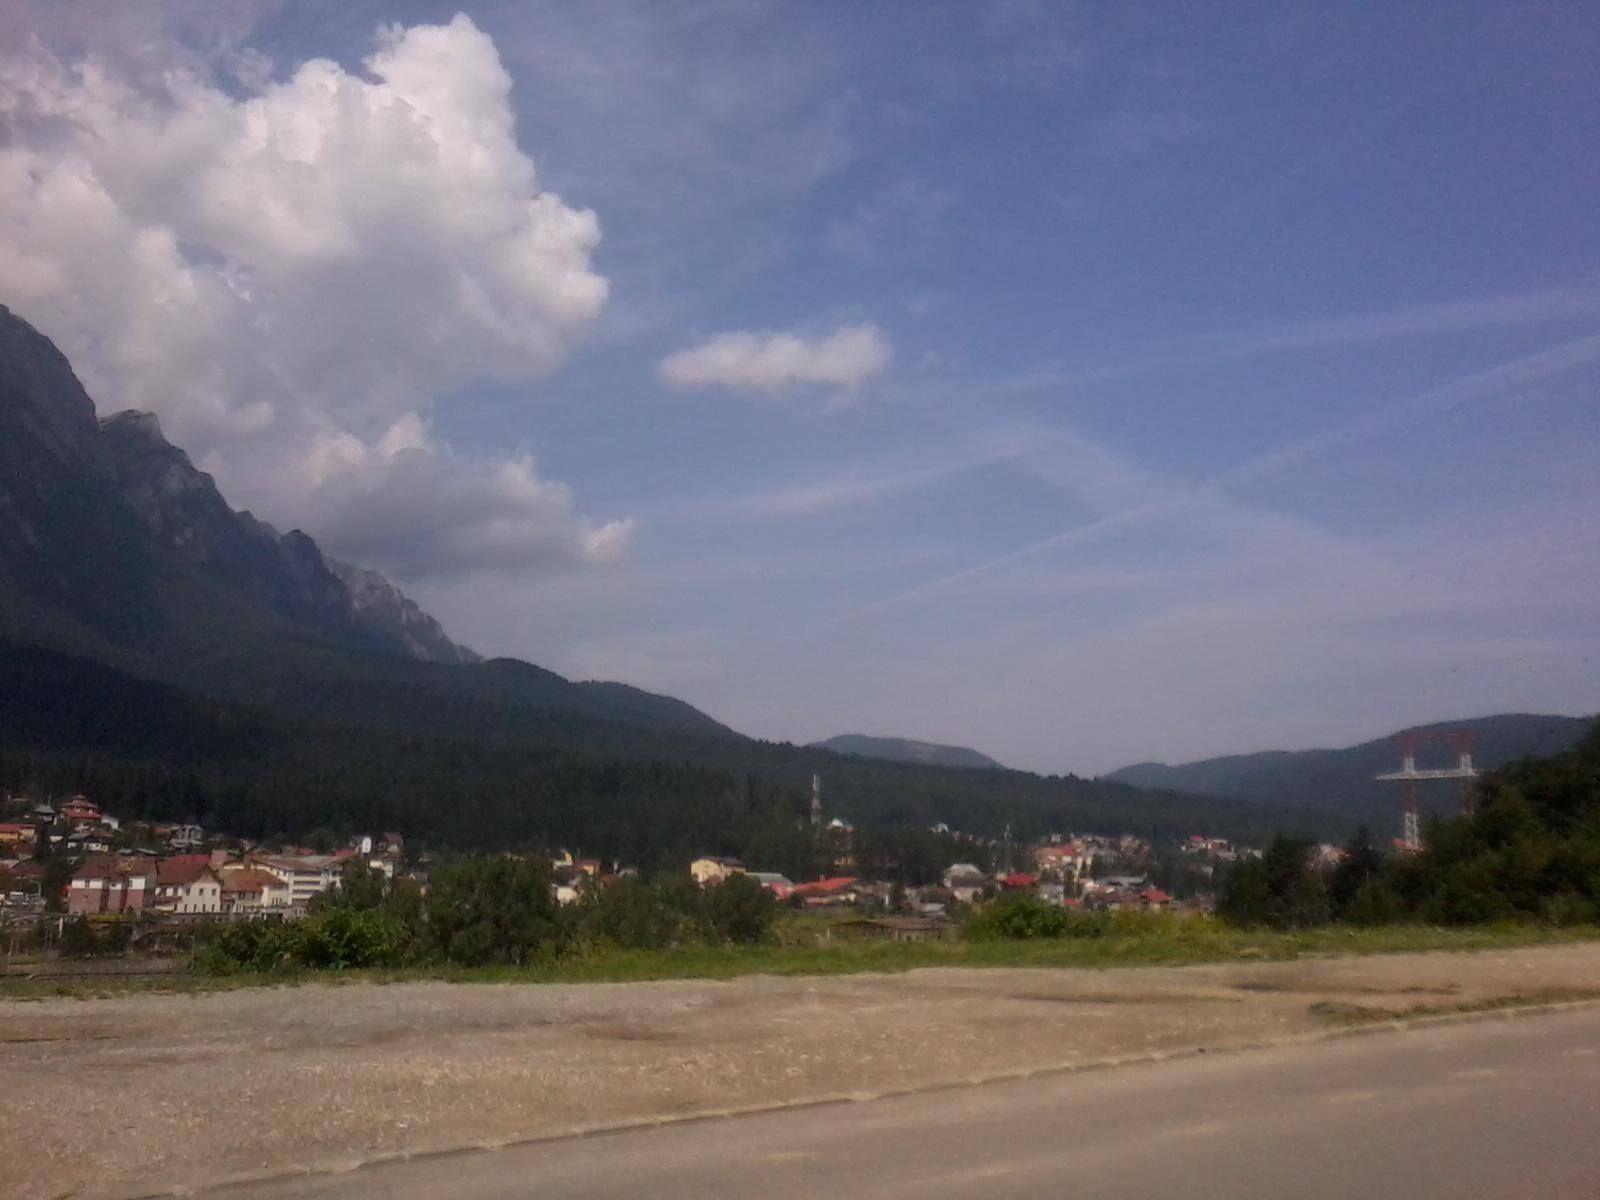 Bucegi Mountains (Chain of Mountains from The Carpathian Mountains)